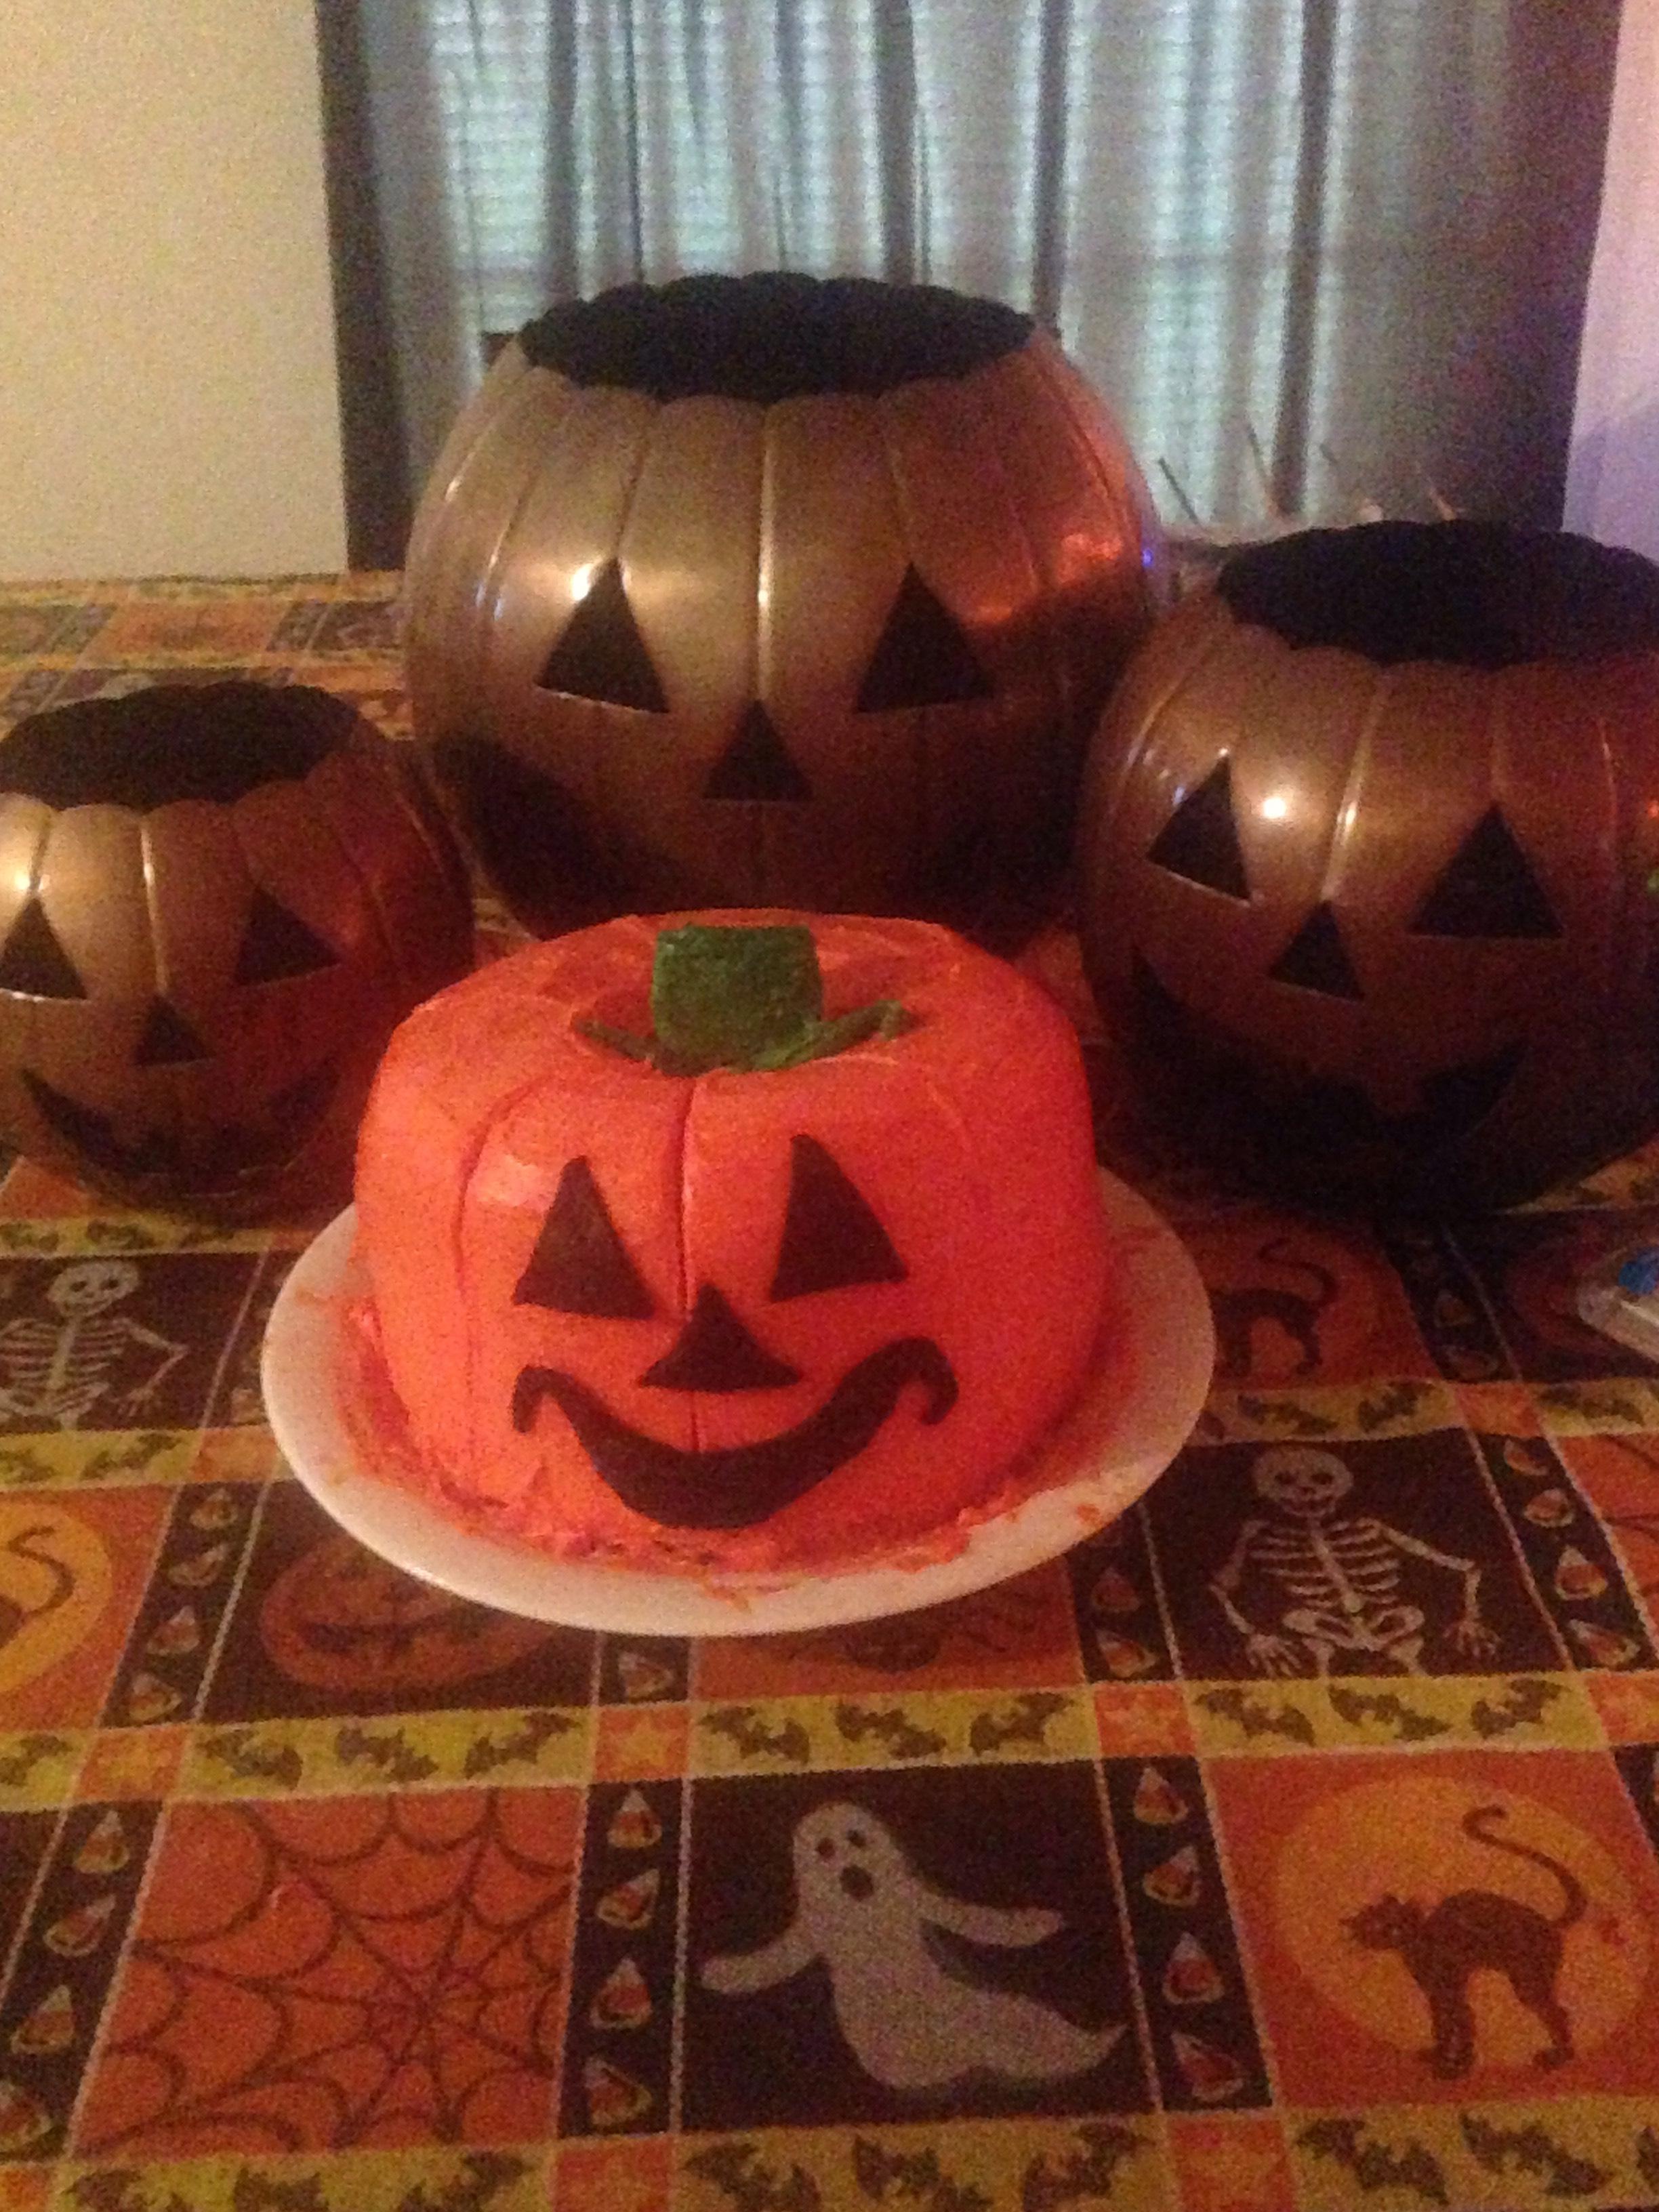 The Great Big Pumpkin Cake